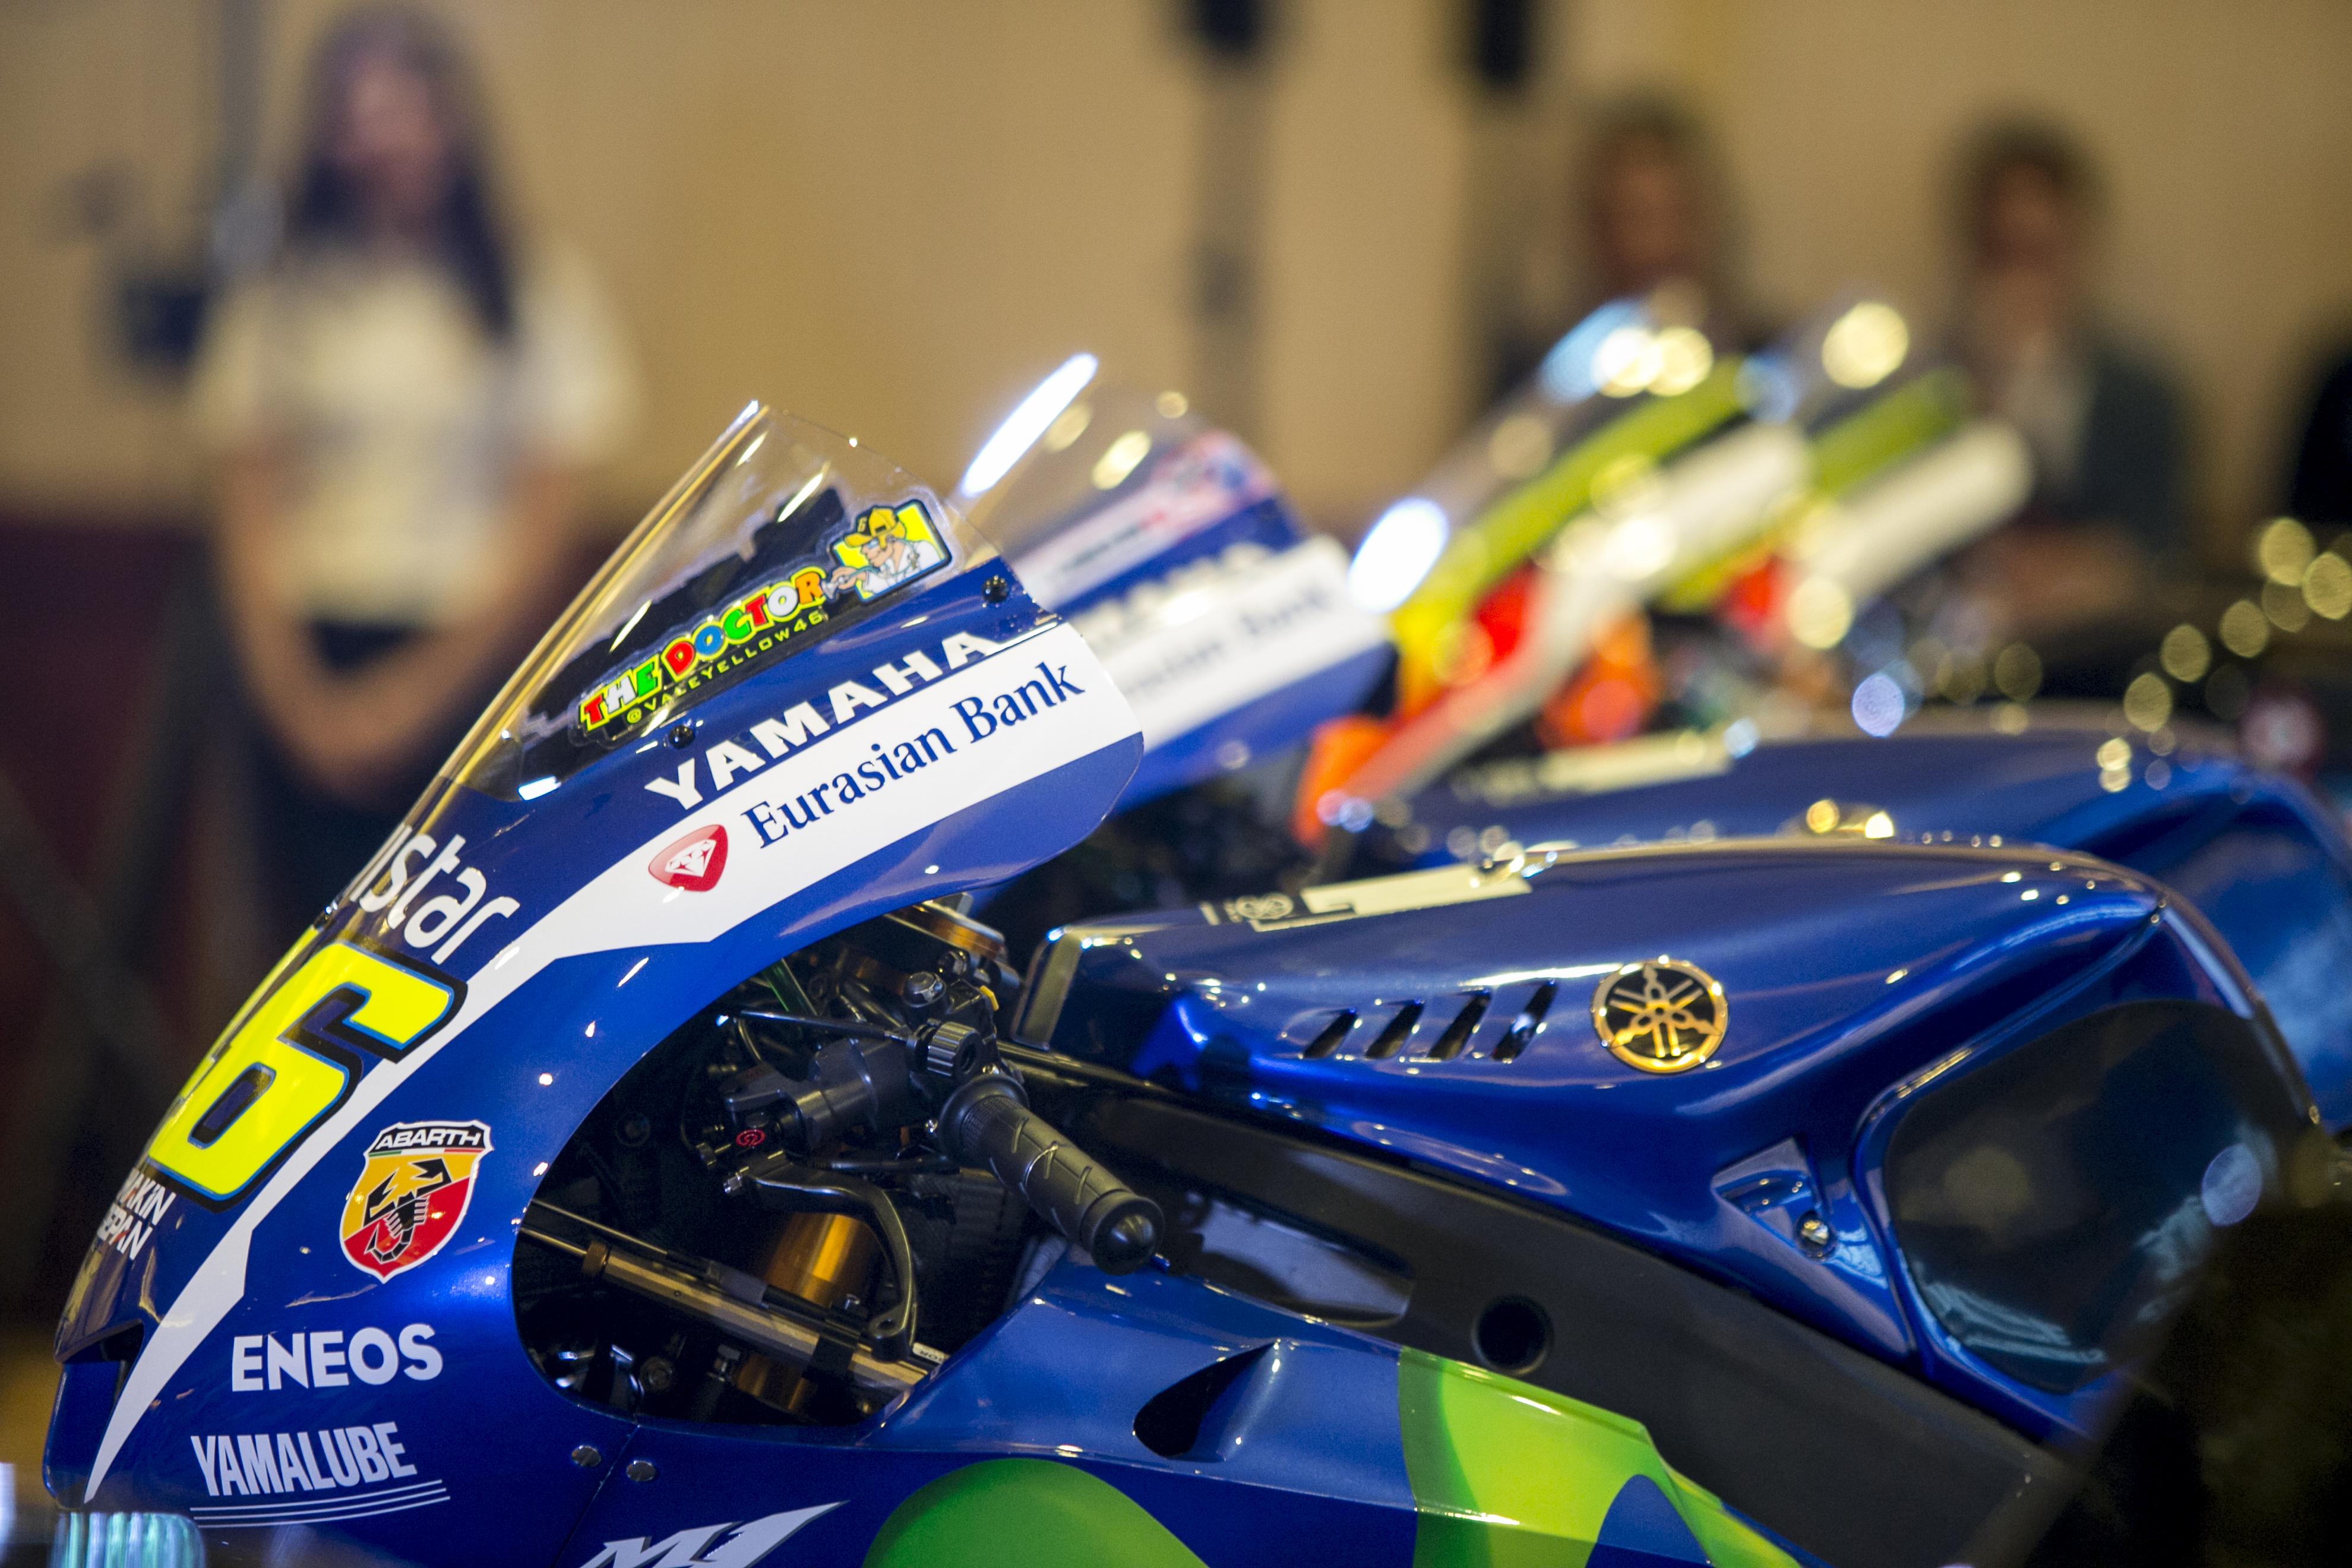 Yamaha Motor Celebrates 60th Year In Motorsports Yamaha Motorのプレスリリース 共同通信prワイヤー